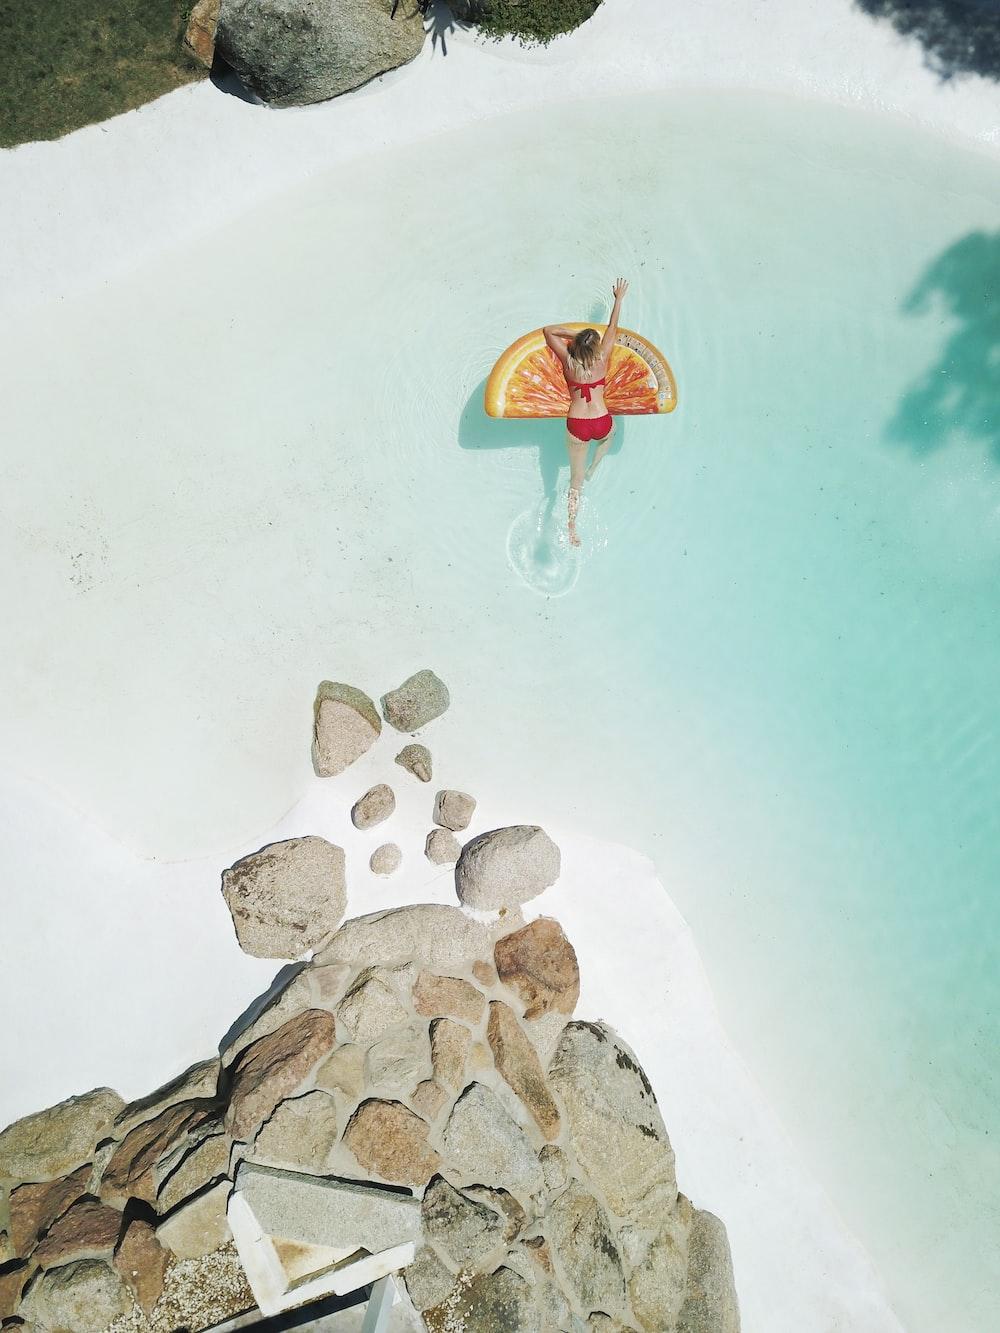 woman on swim ring